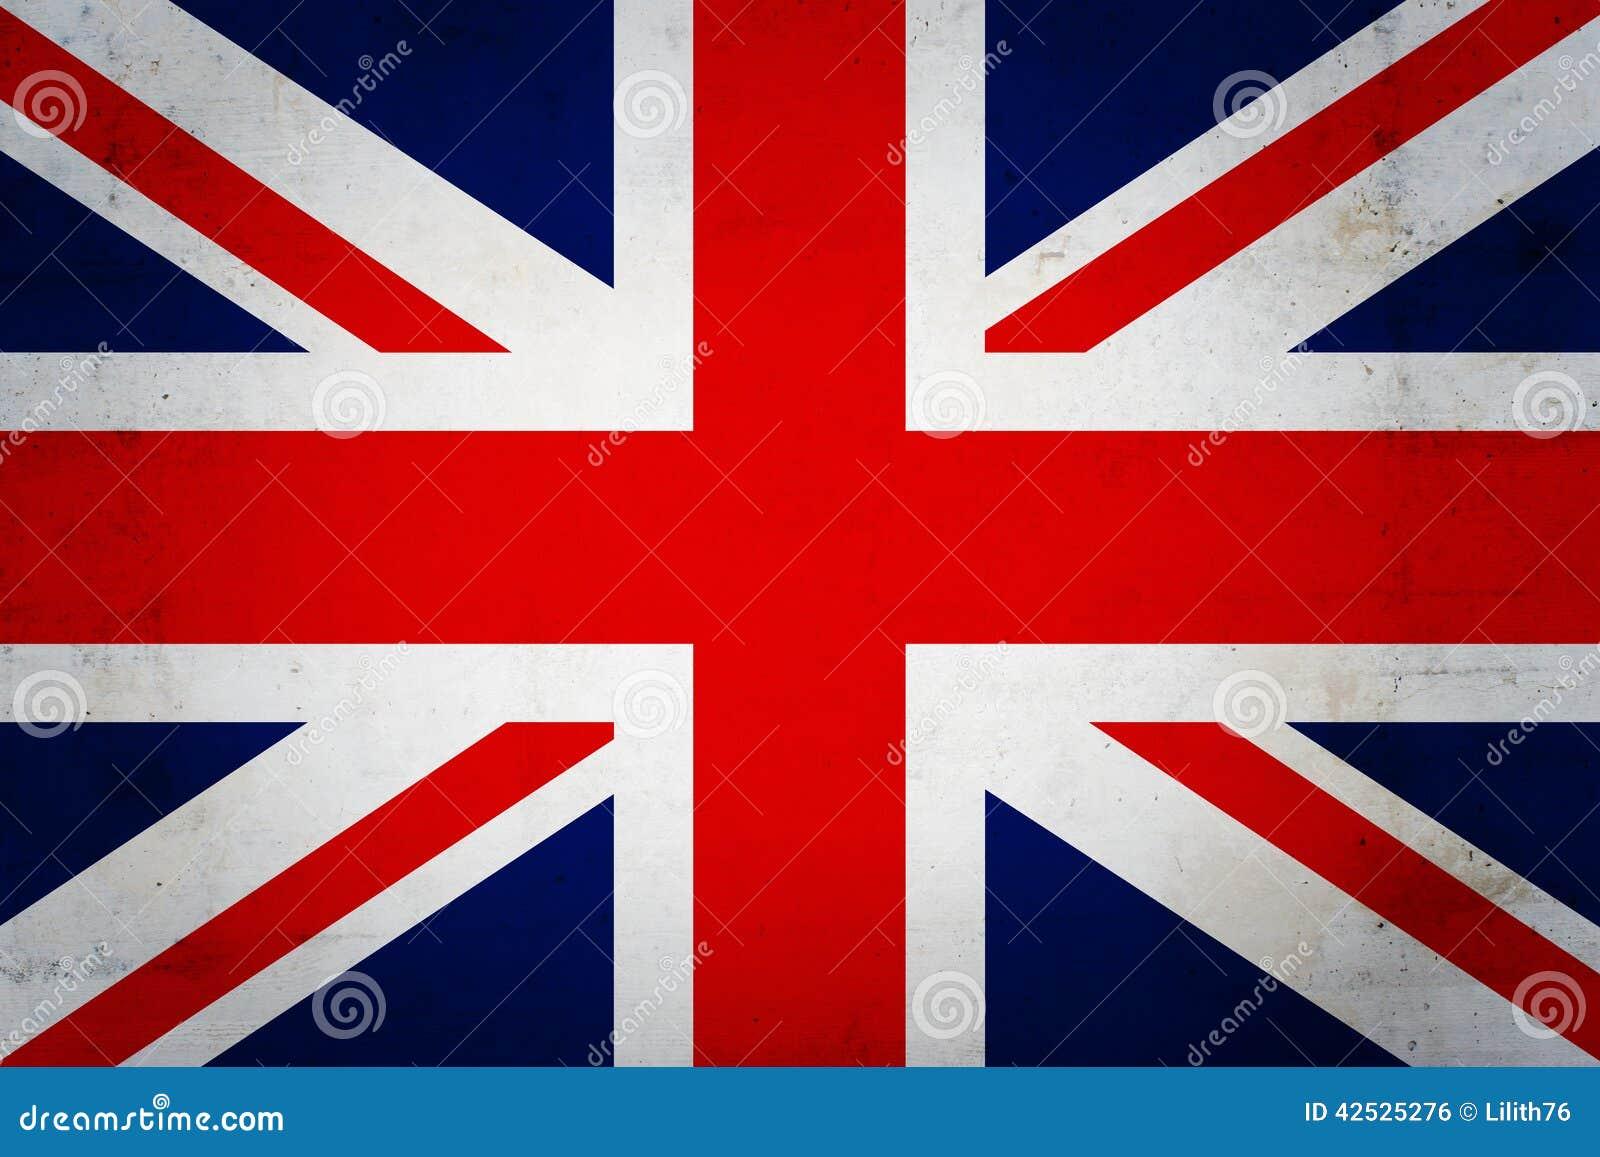 Anglik flagę